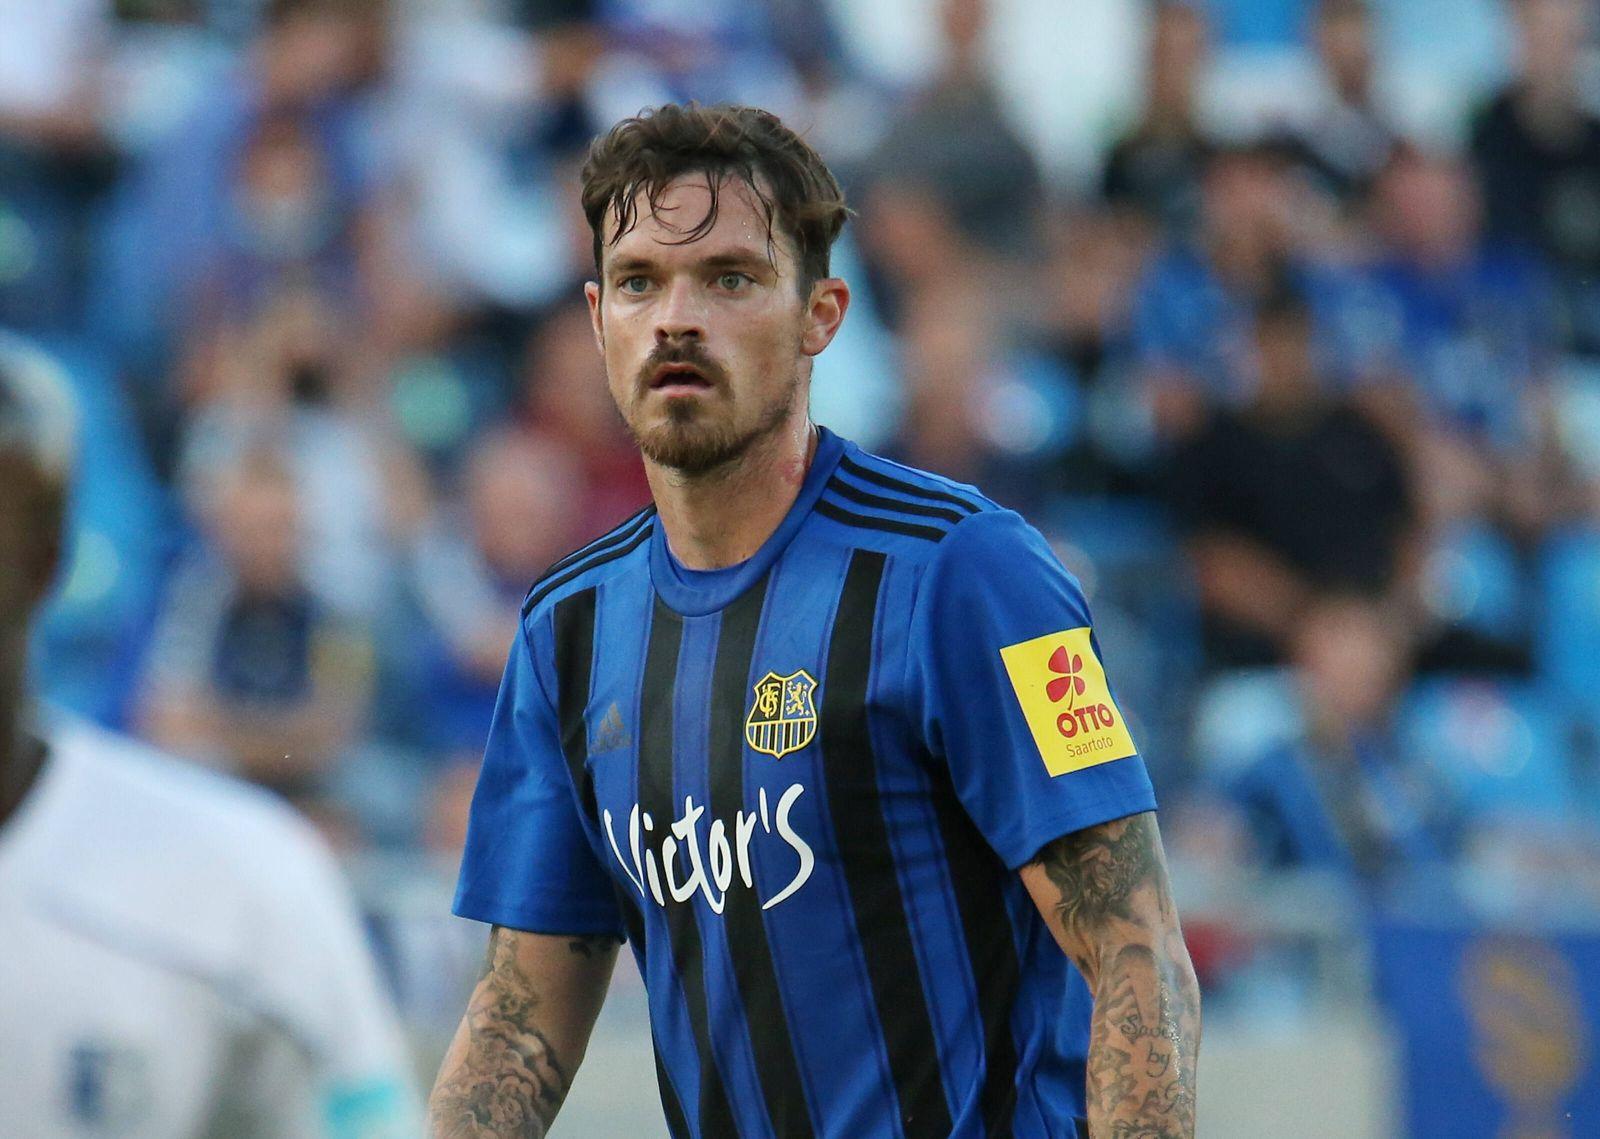 25.08.2021, xklex, Fussball 3.Liga, 1.FC Saarbruecken - 1.FC Magdeburg emspor, v.l. Dennis Erdmann (1.FC Saarbruecken)